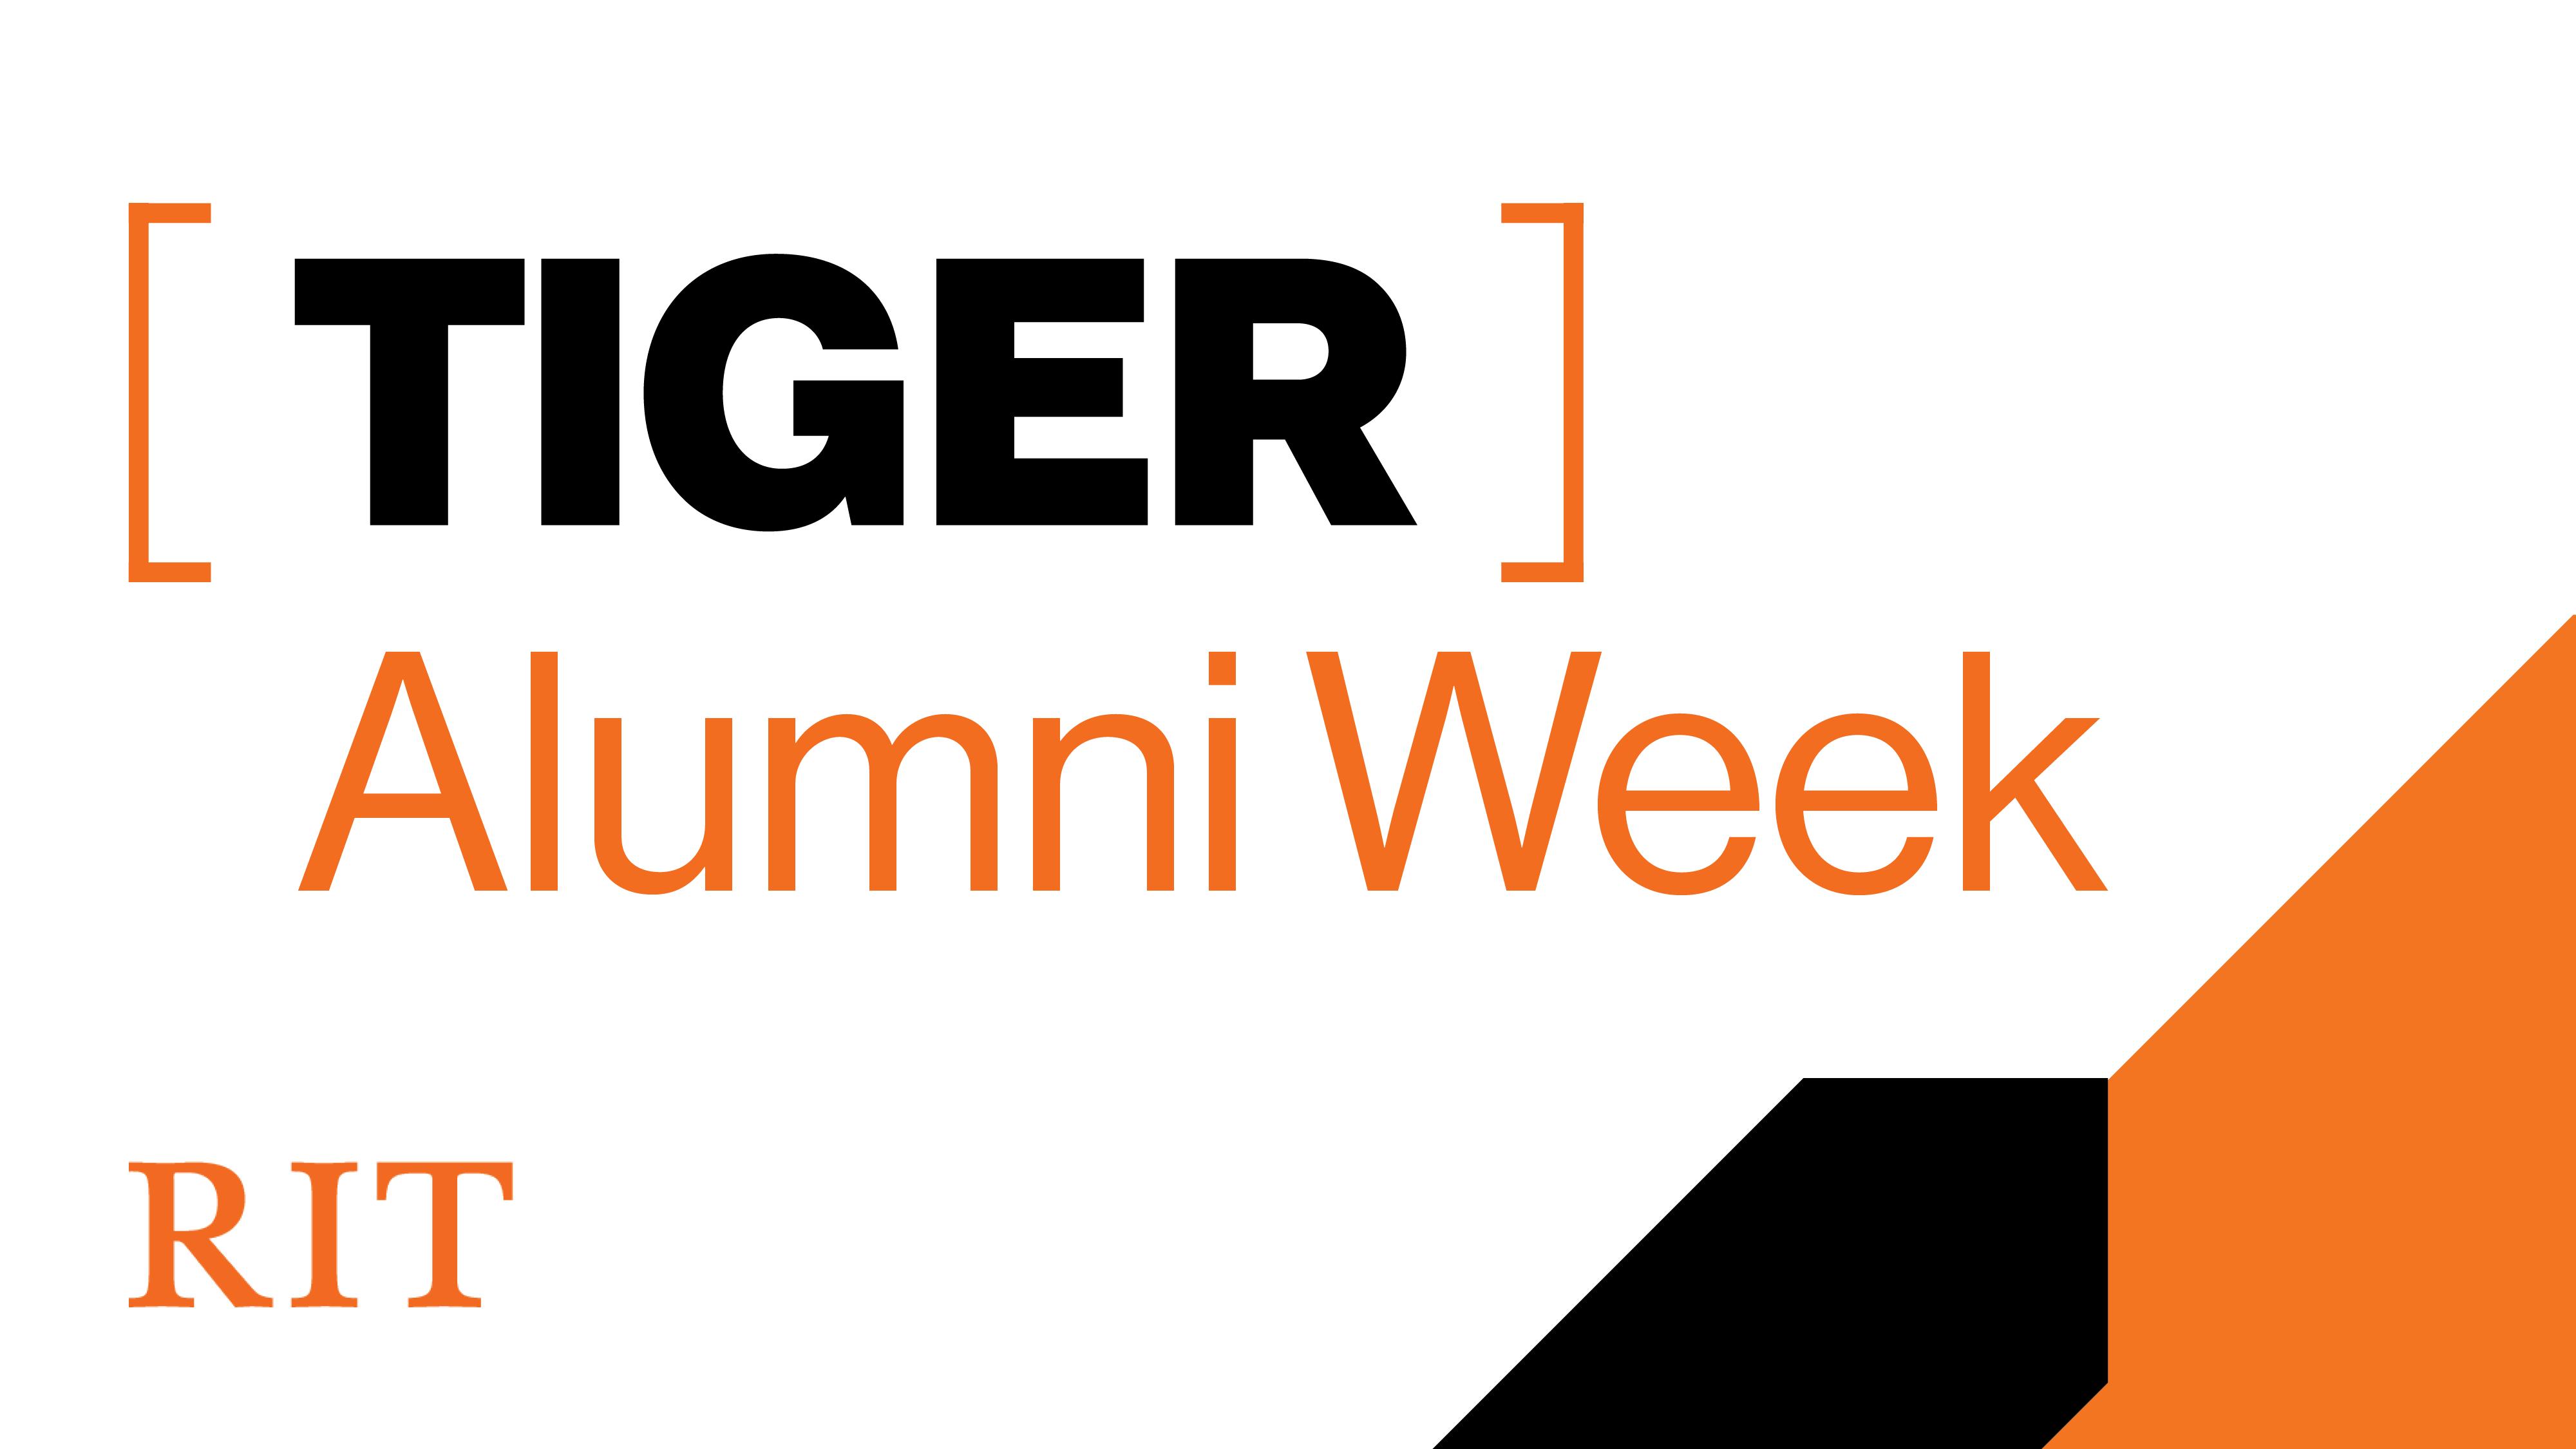 Tiger Alumni Week